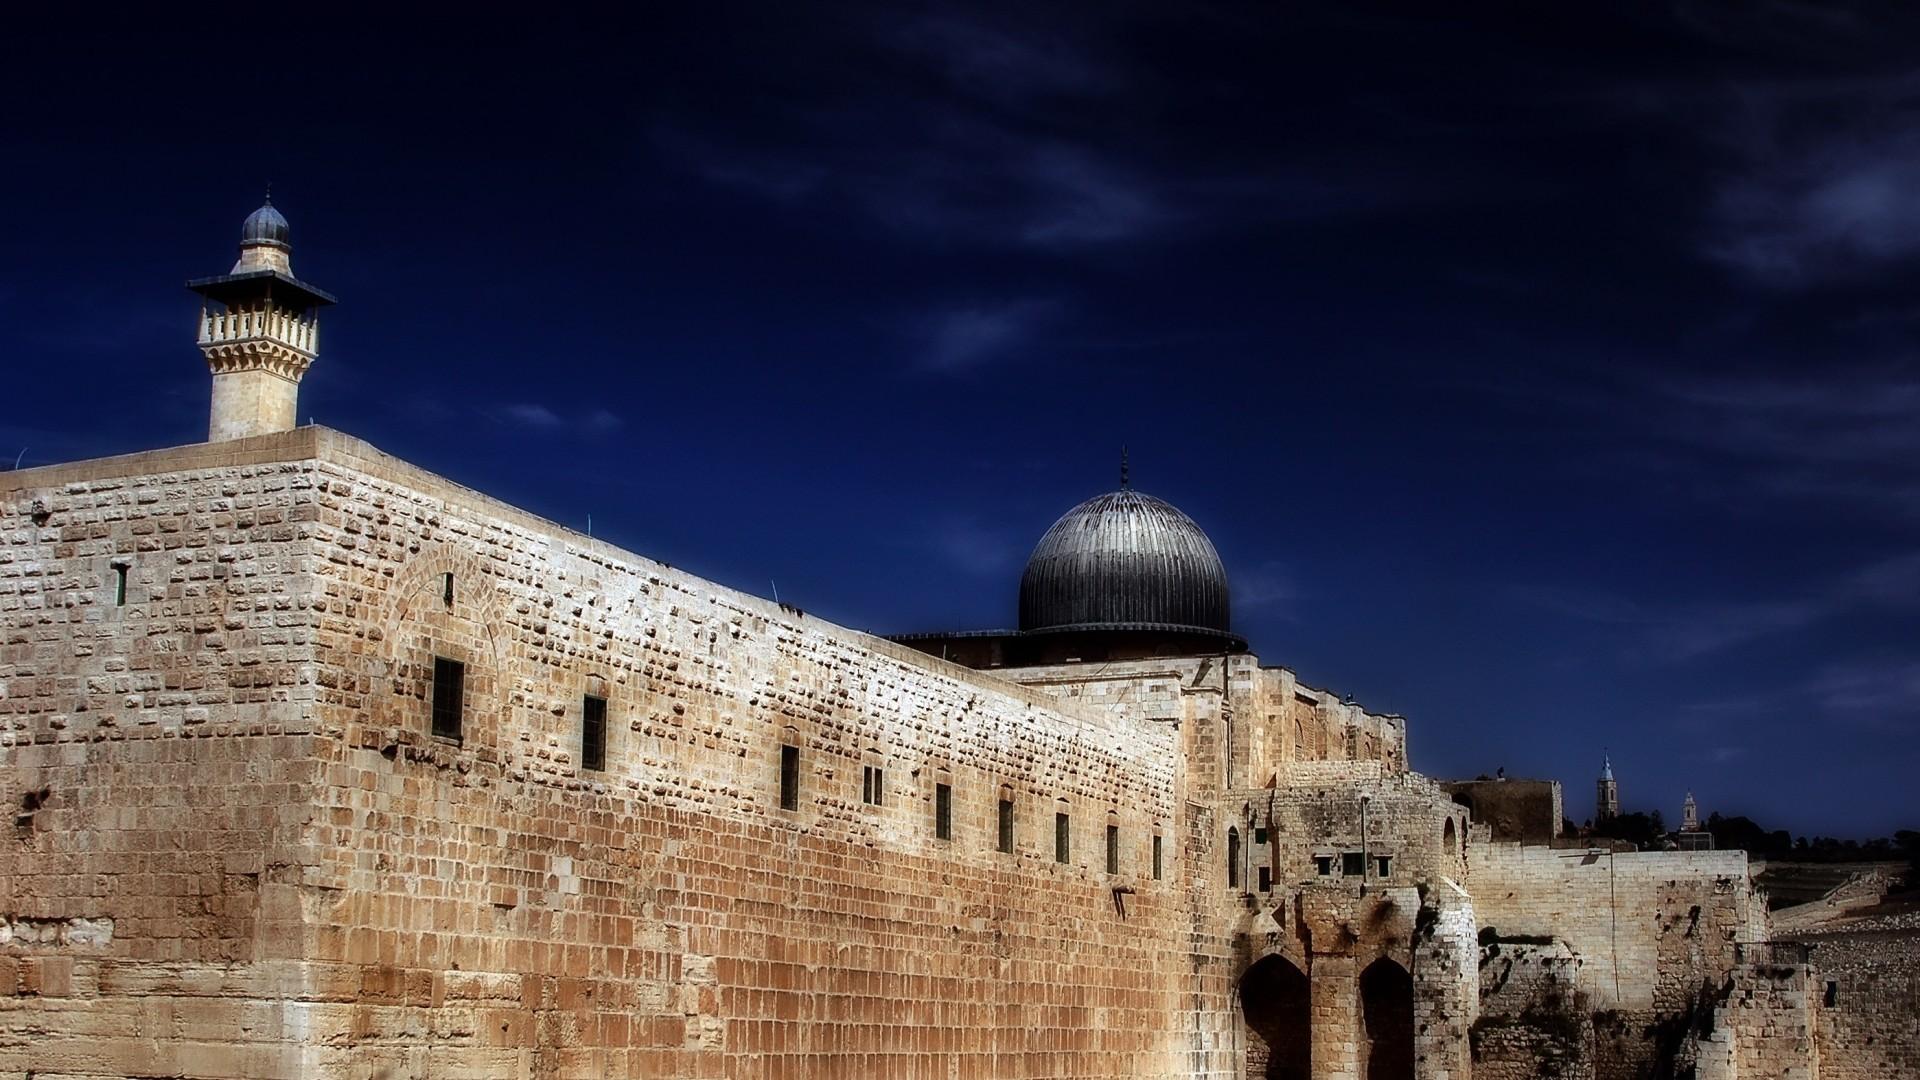 Israel Wallpapers | Best Wallpapers